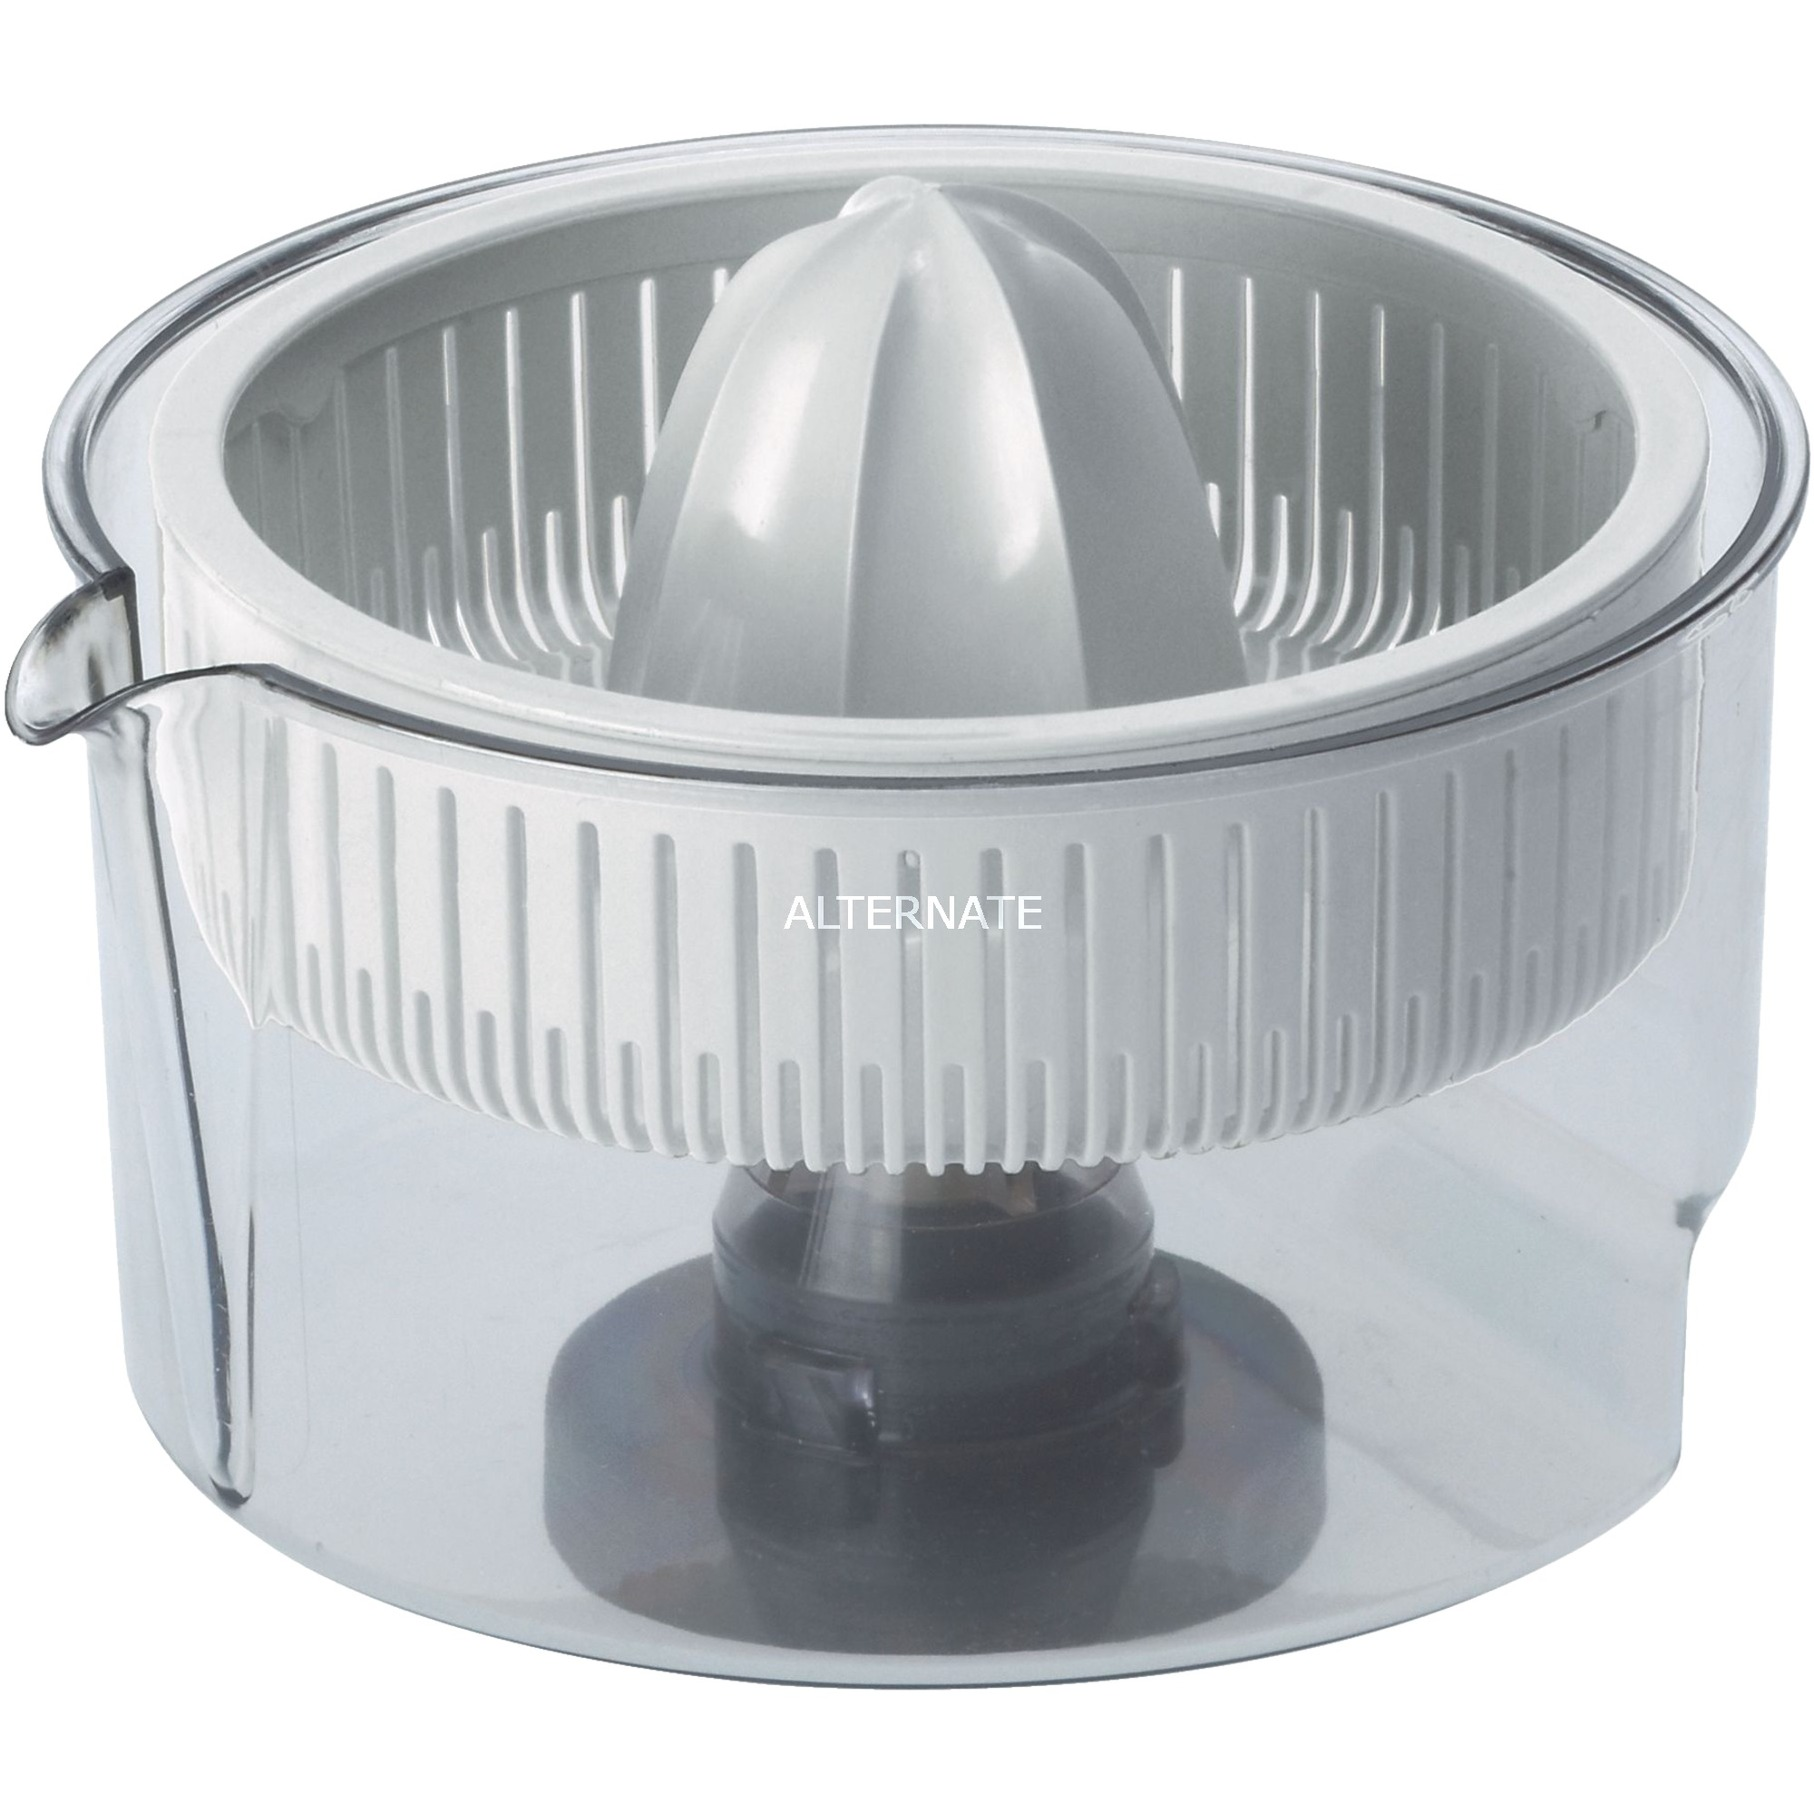 MUZ8ZP1 batidora y accesorio para mezclar alimentos, Robot de cocina